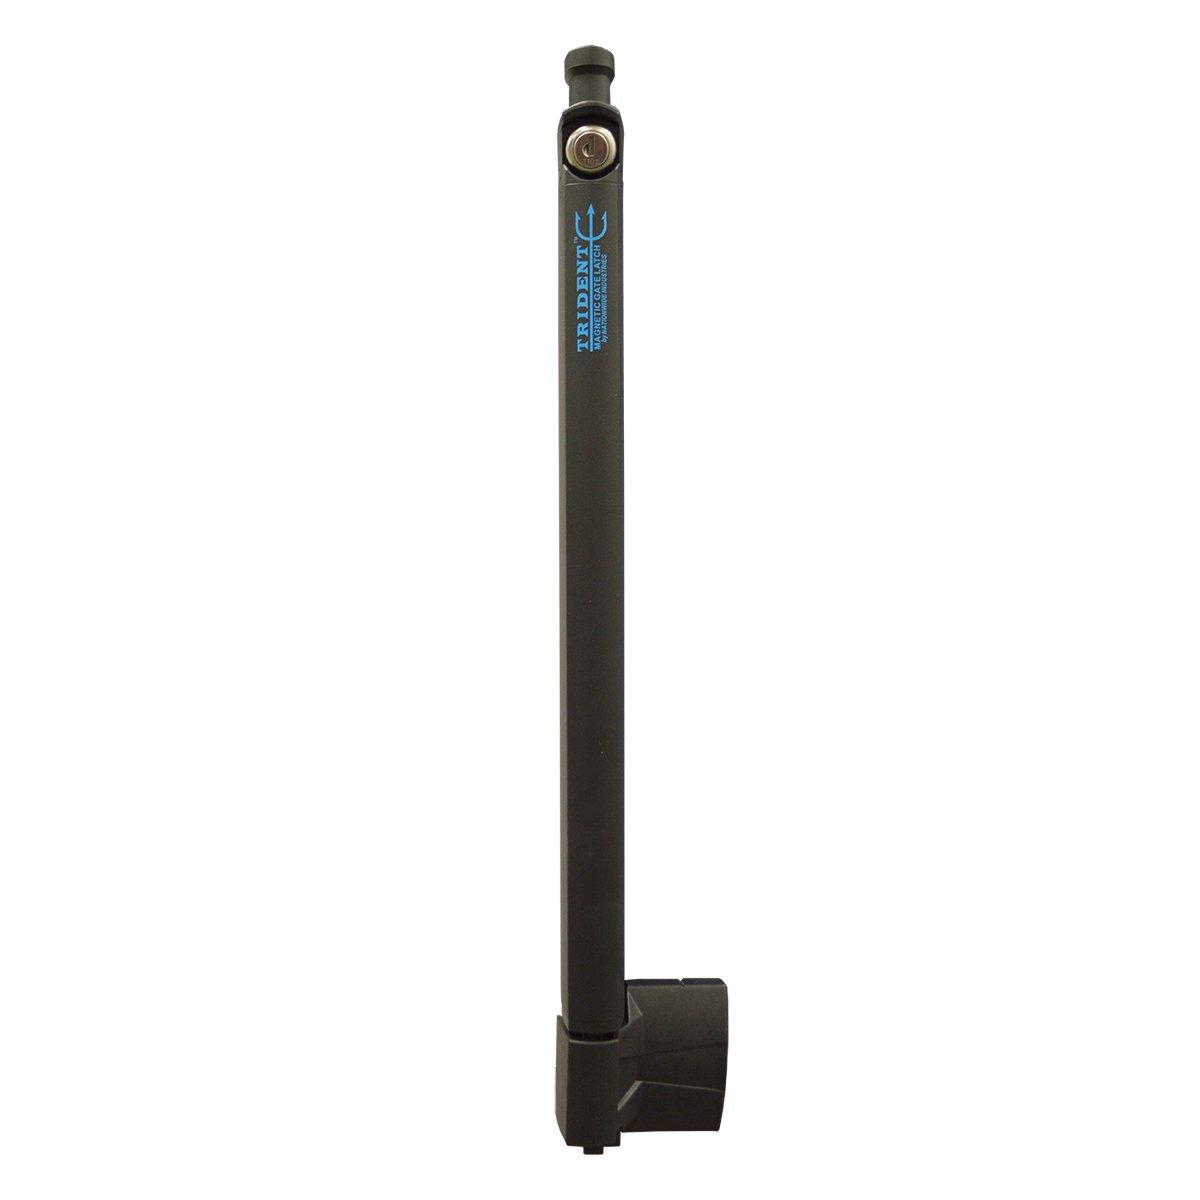 Trident 20 Inch Tall Black Magnetic Pool Child Safety Gate Latch   Keyed Alike   TRIDENT-20-BK-KA